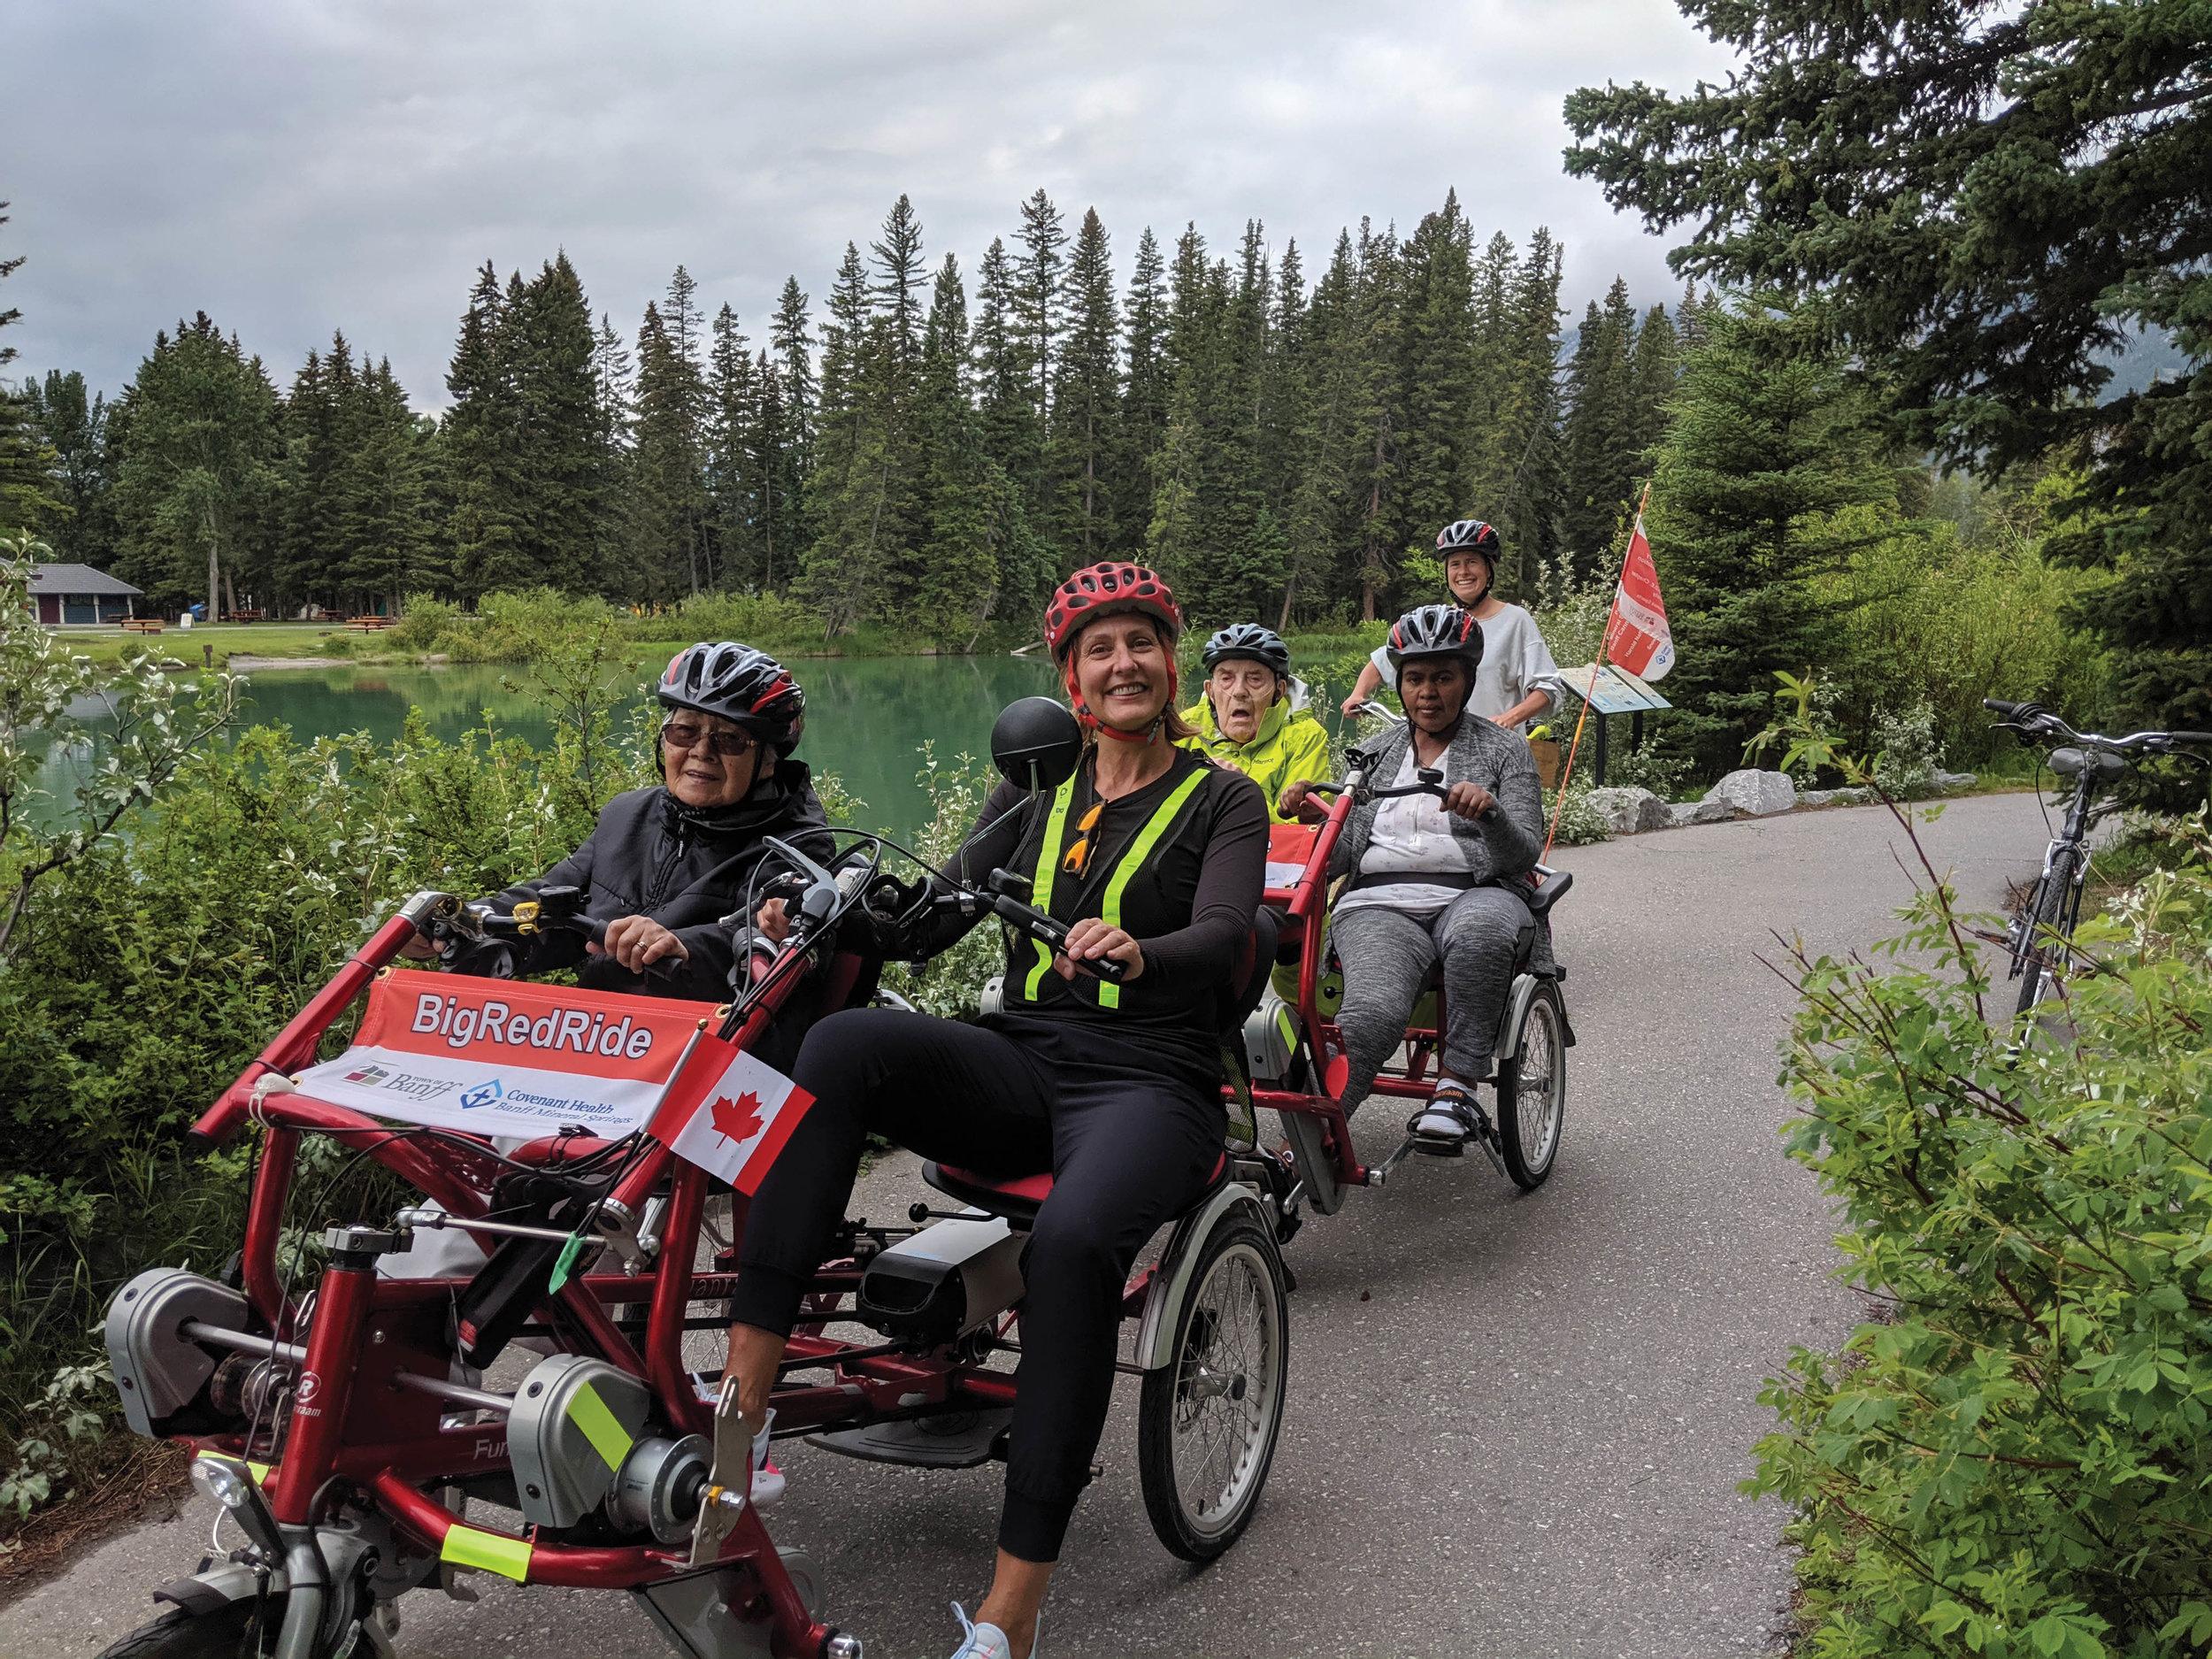 Big Red Ride by Barb Pelham